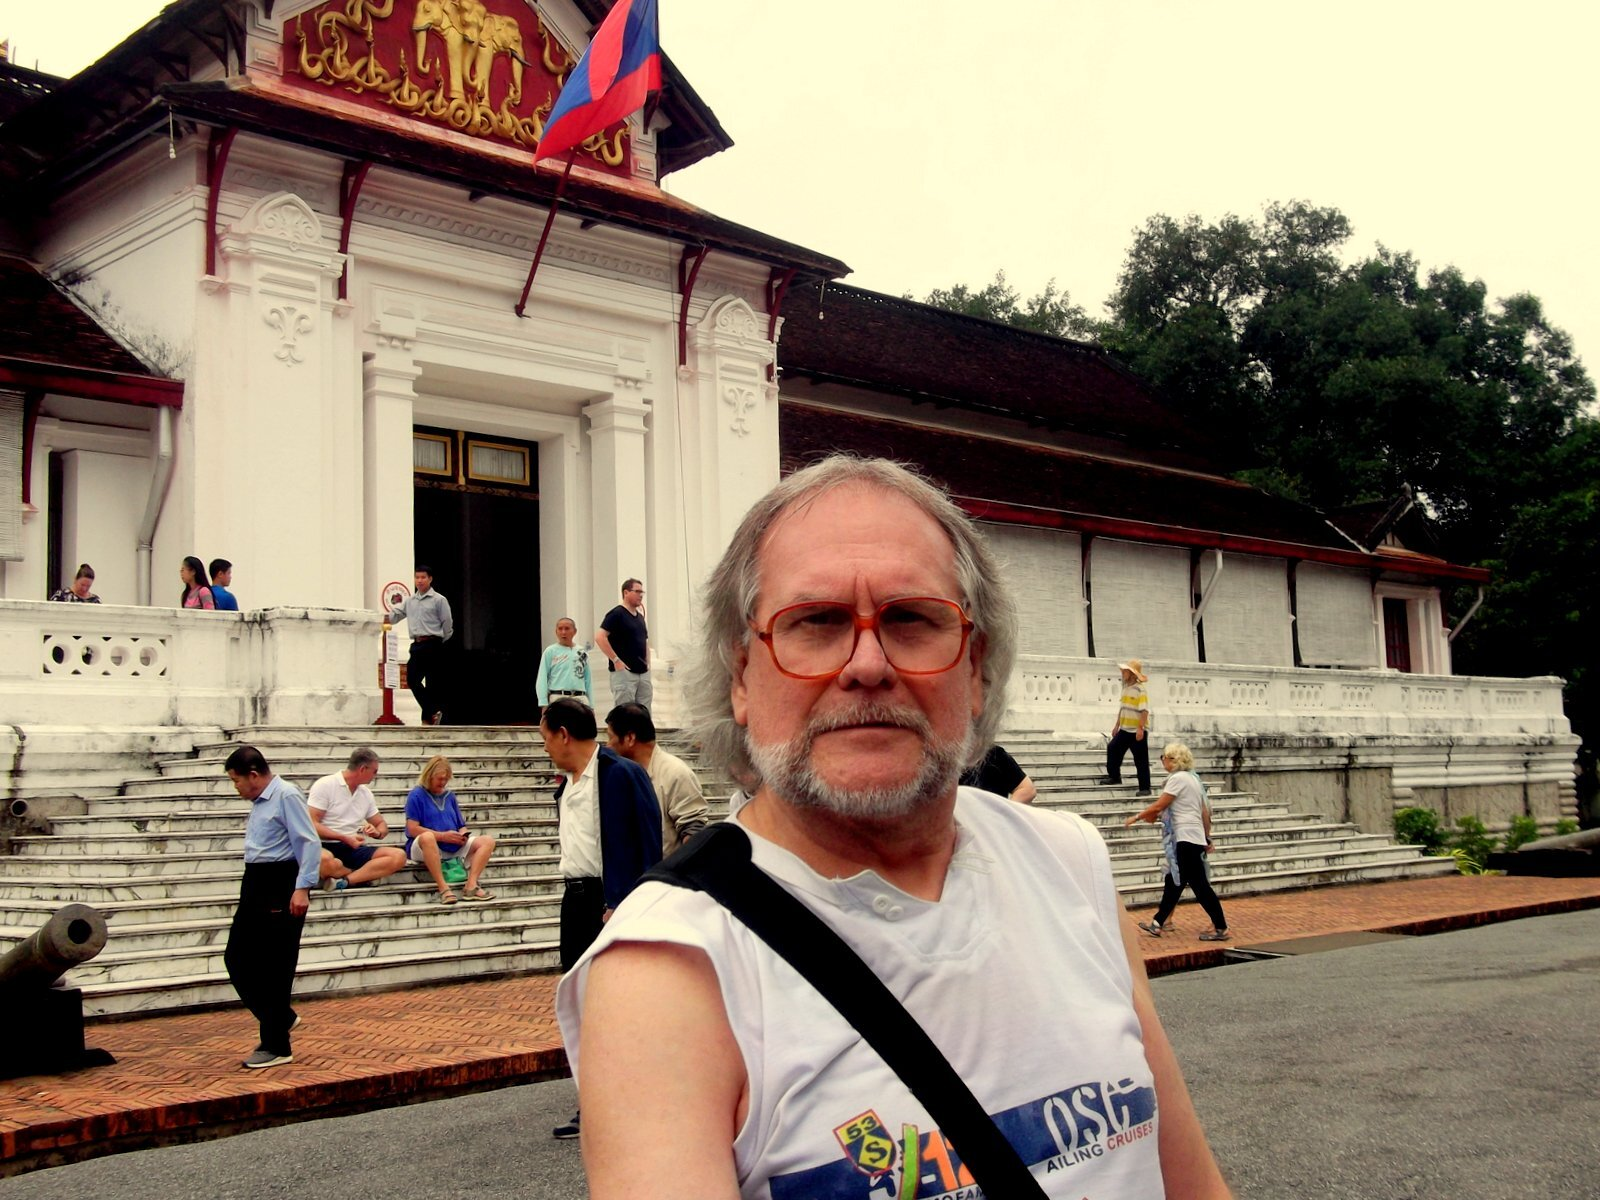 ЛАОС, Луанг-Прабанг. Королевский дворец-музей, Храм (Ват) Сиенгтхонг